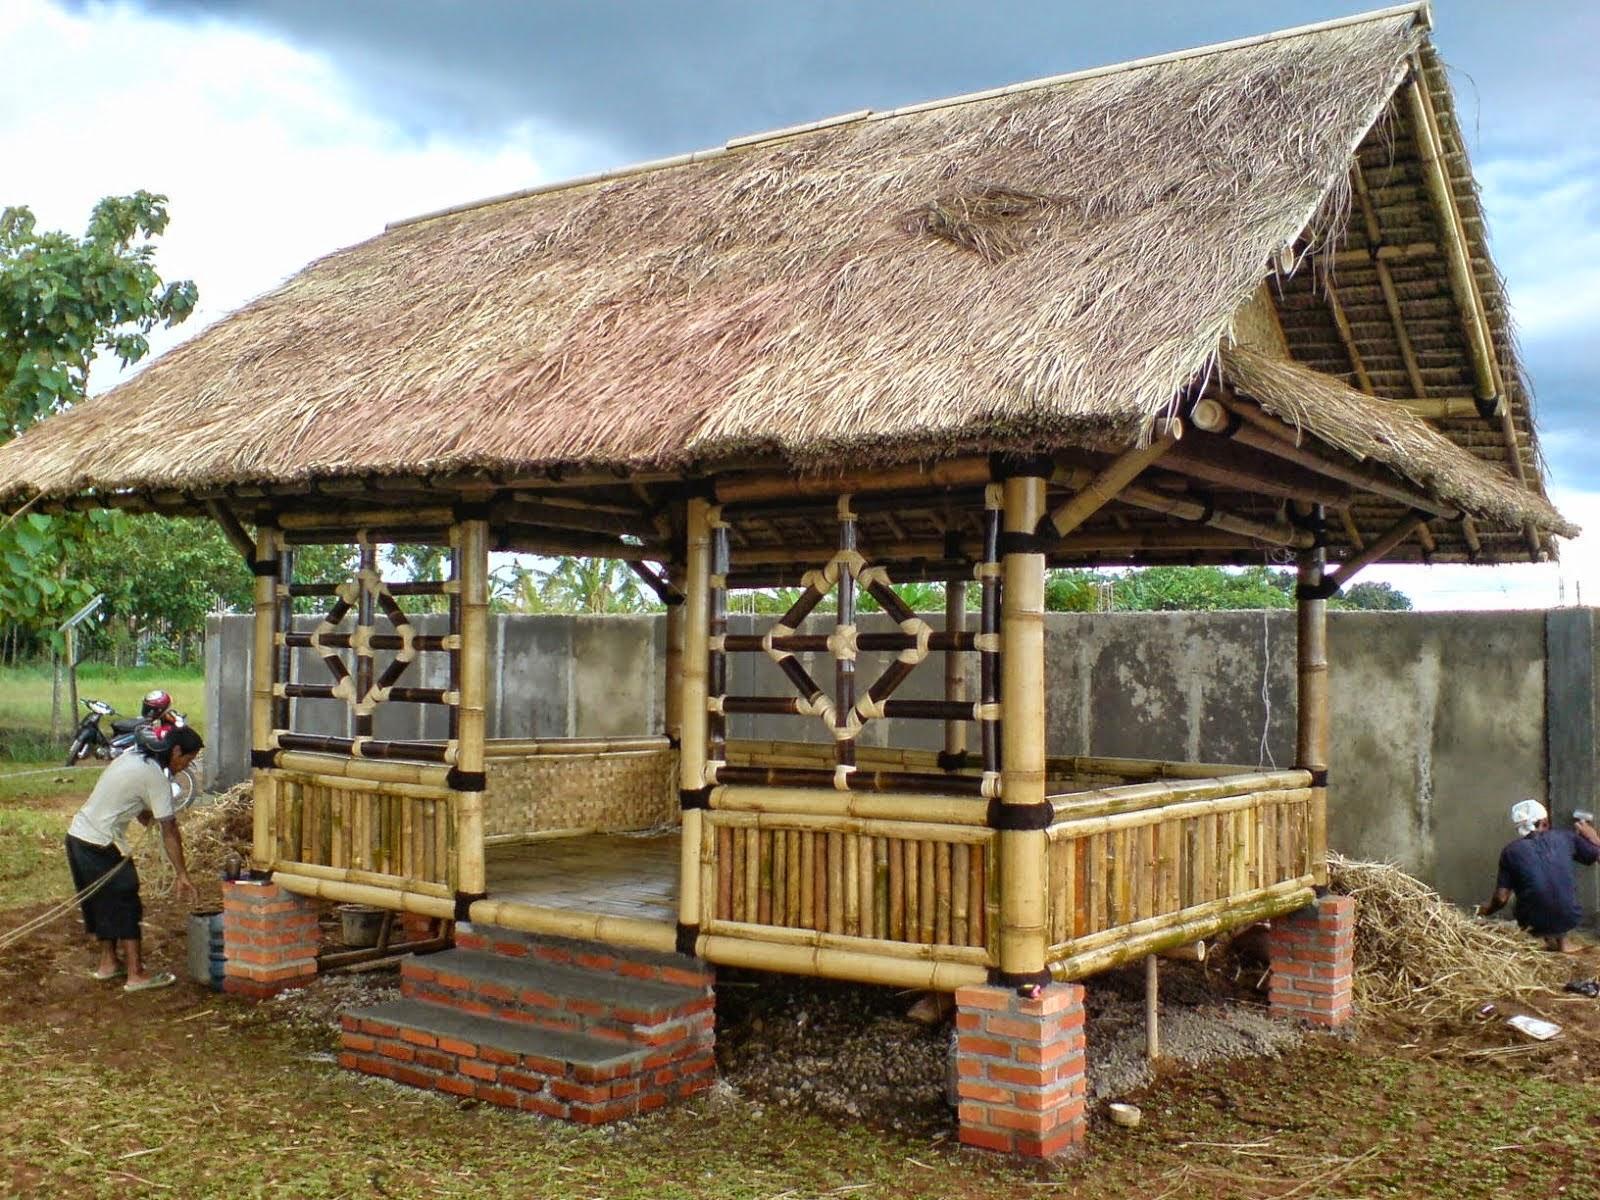 Jual saung bambu | jasa perakit rumah bambu | saung kayu kelapa | taman minimalis